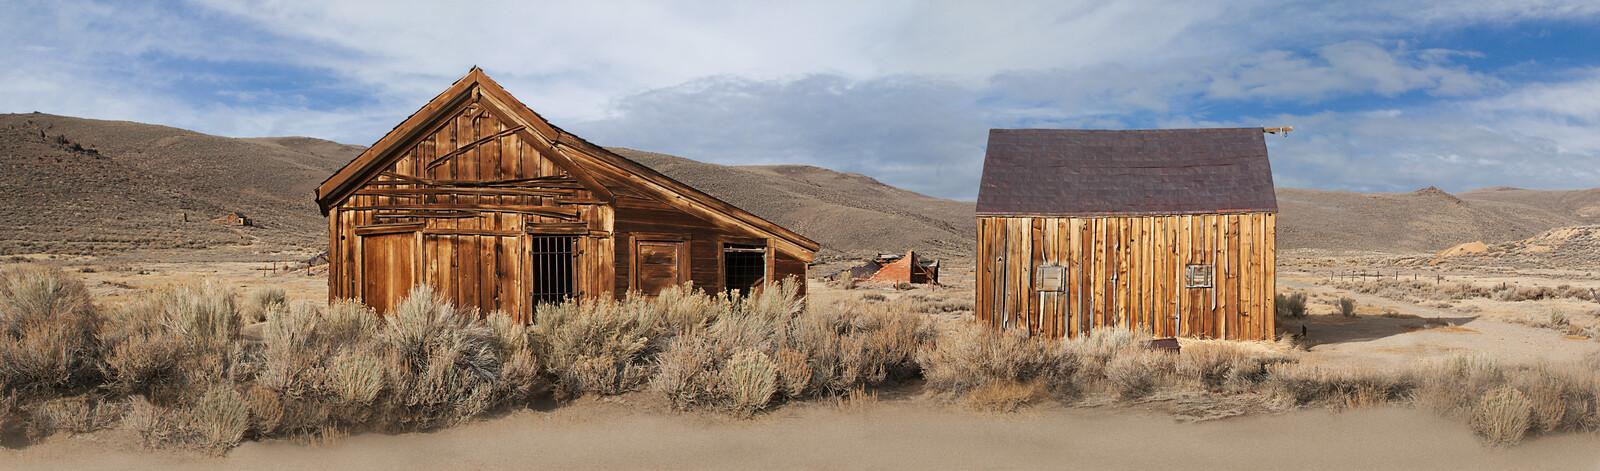 Bodie, California, King St. - Larry Yust